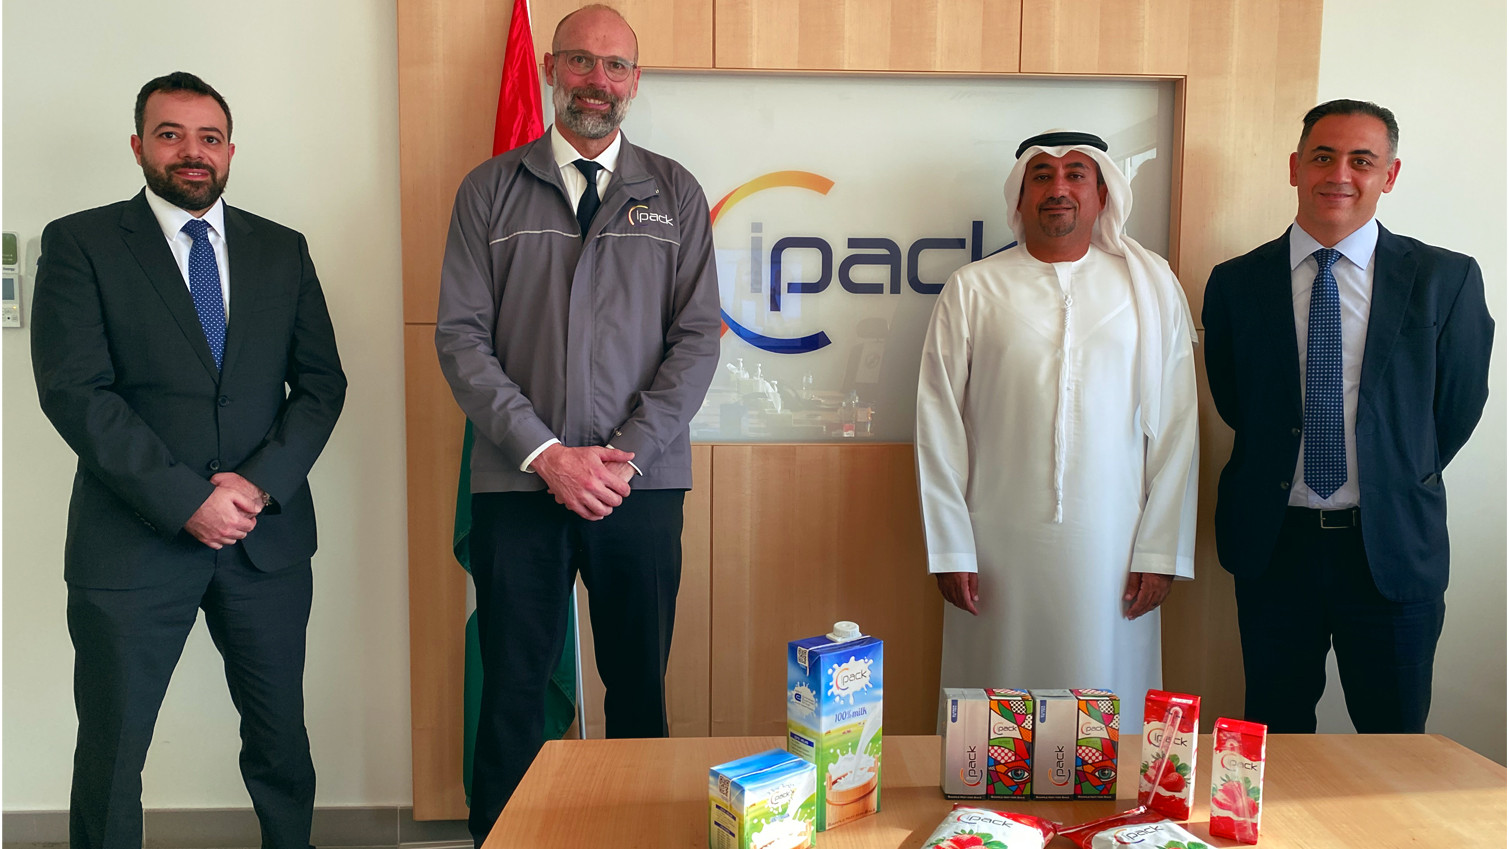 Emirates Development finances Ipack